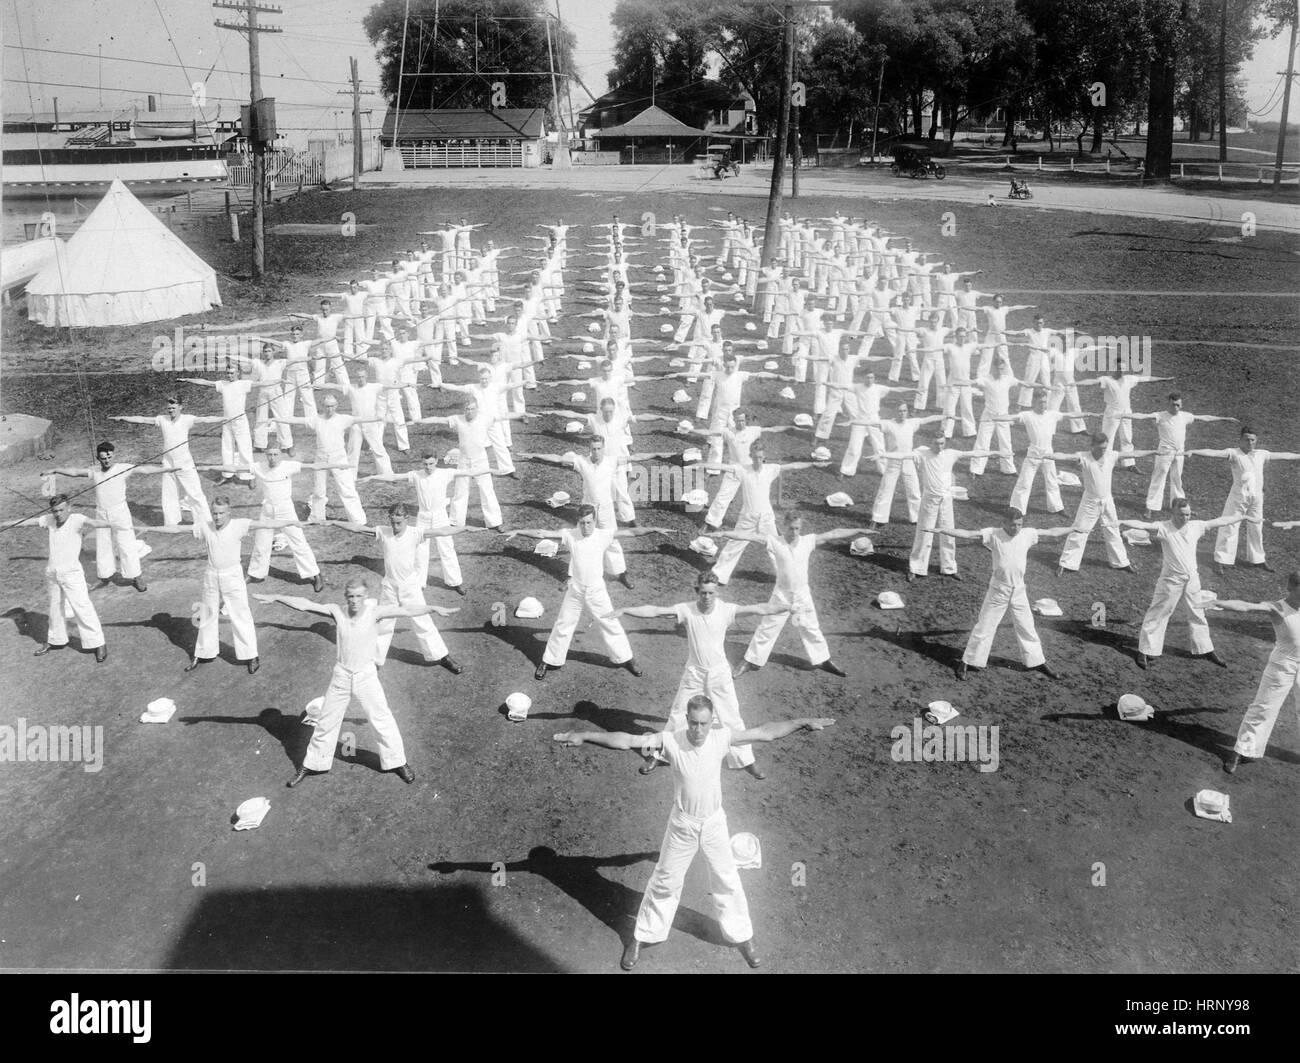 WWI, Naval Militia Camp Exercise, 1918 - Stock Image